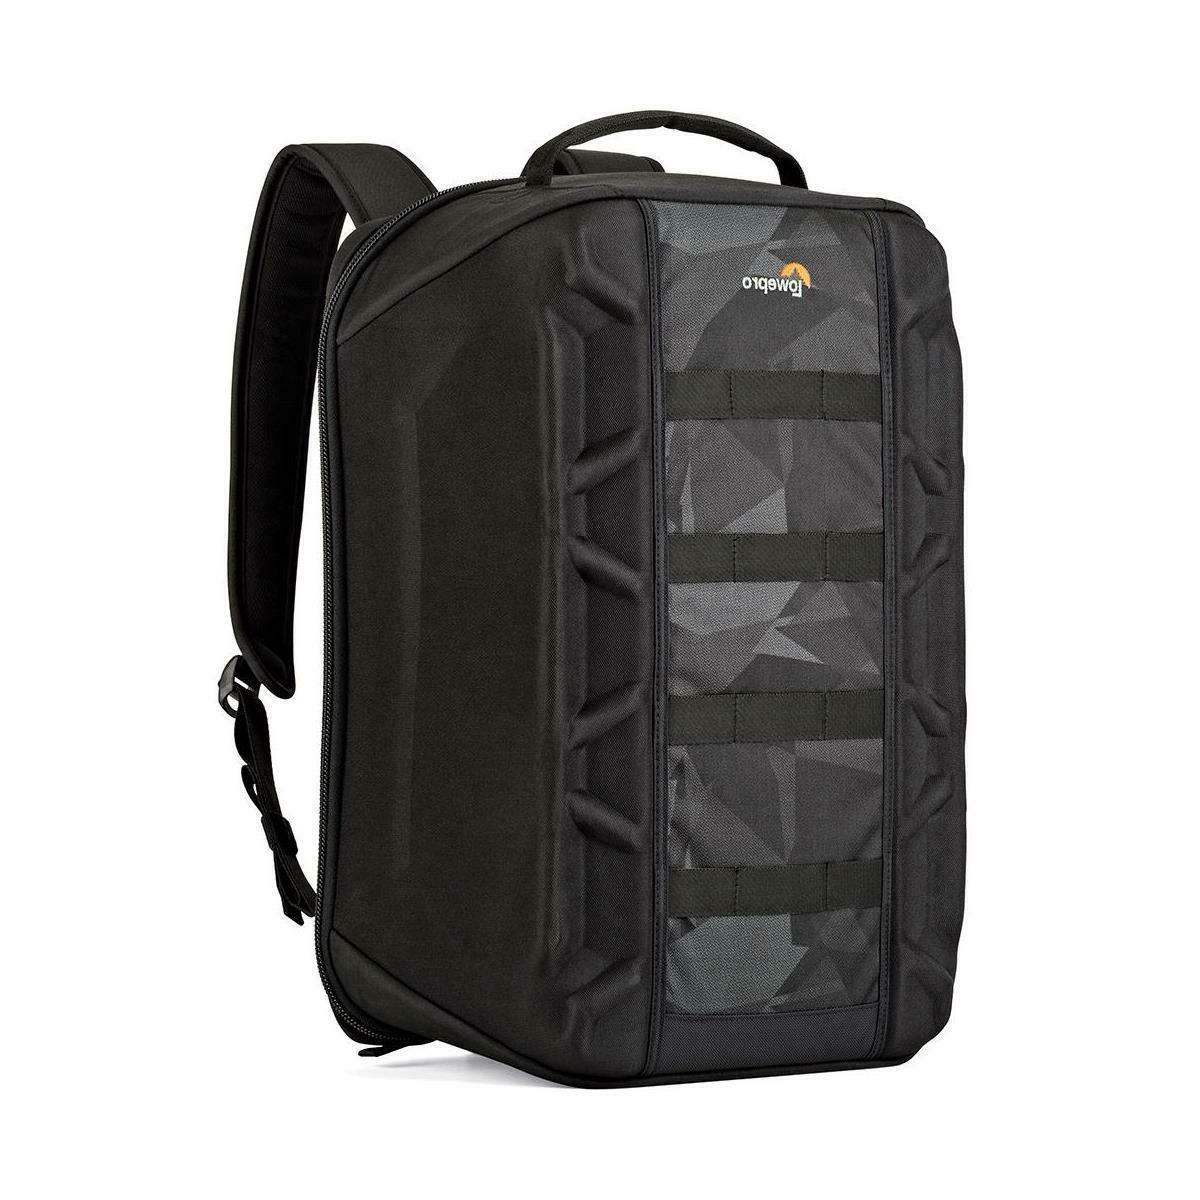 droneguard bp 400 camera bag backpack